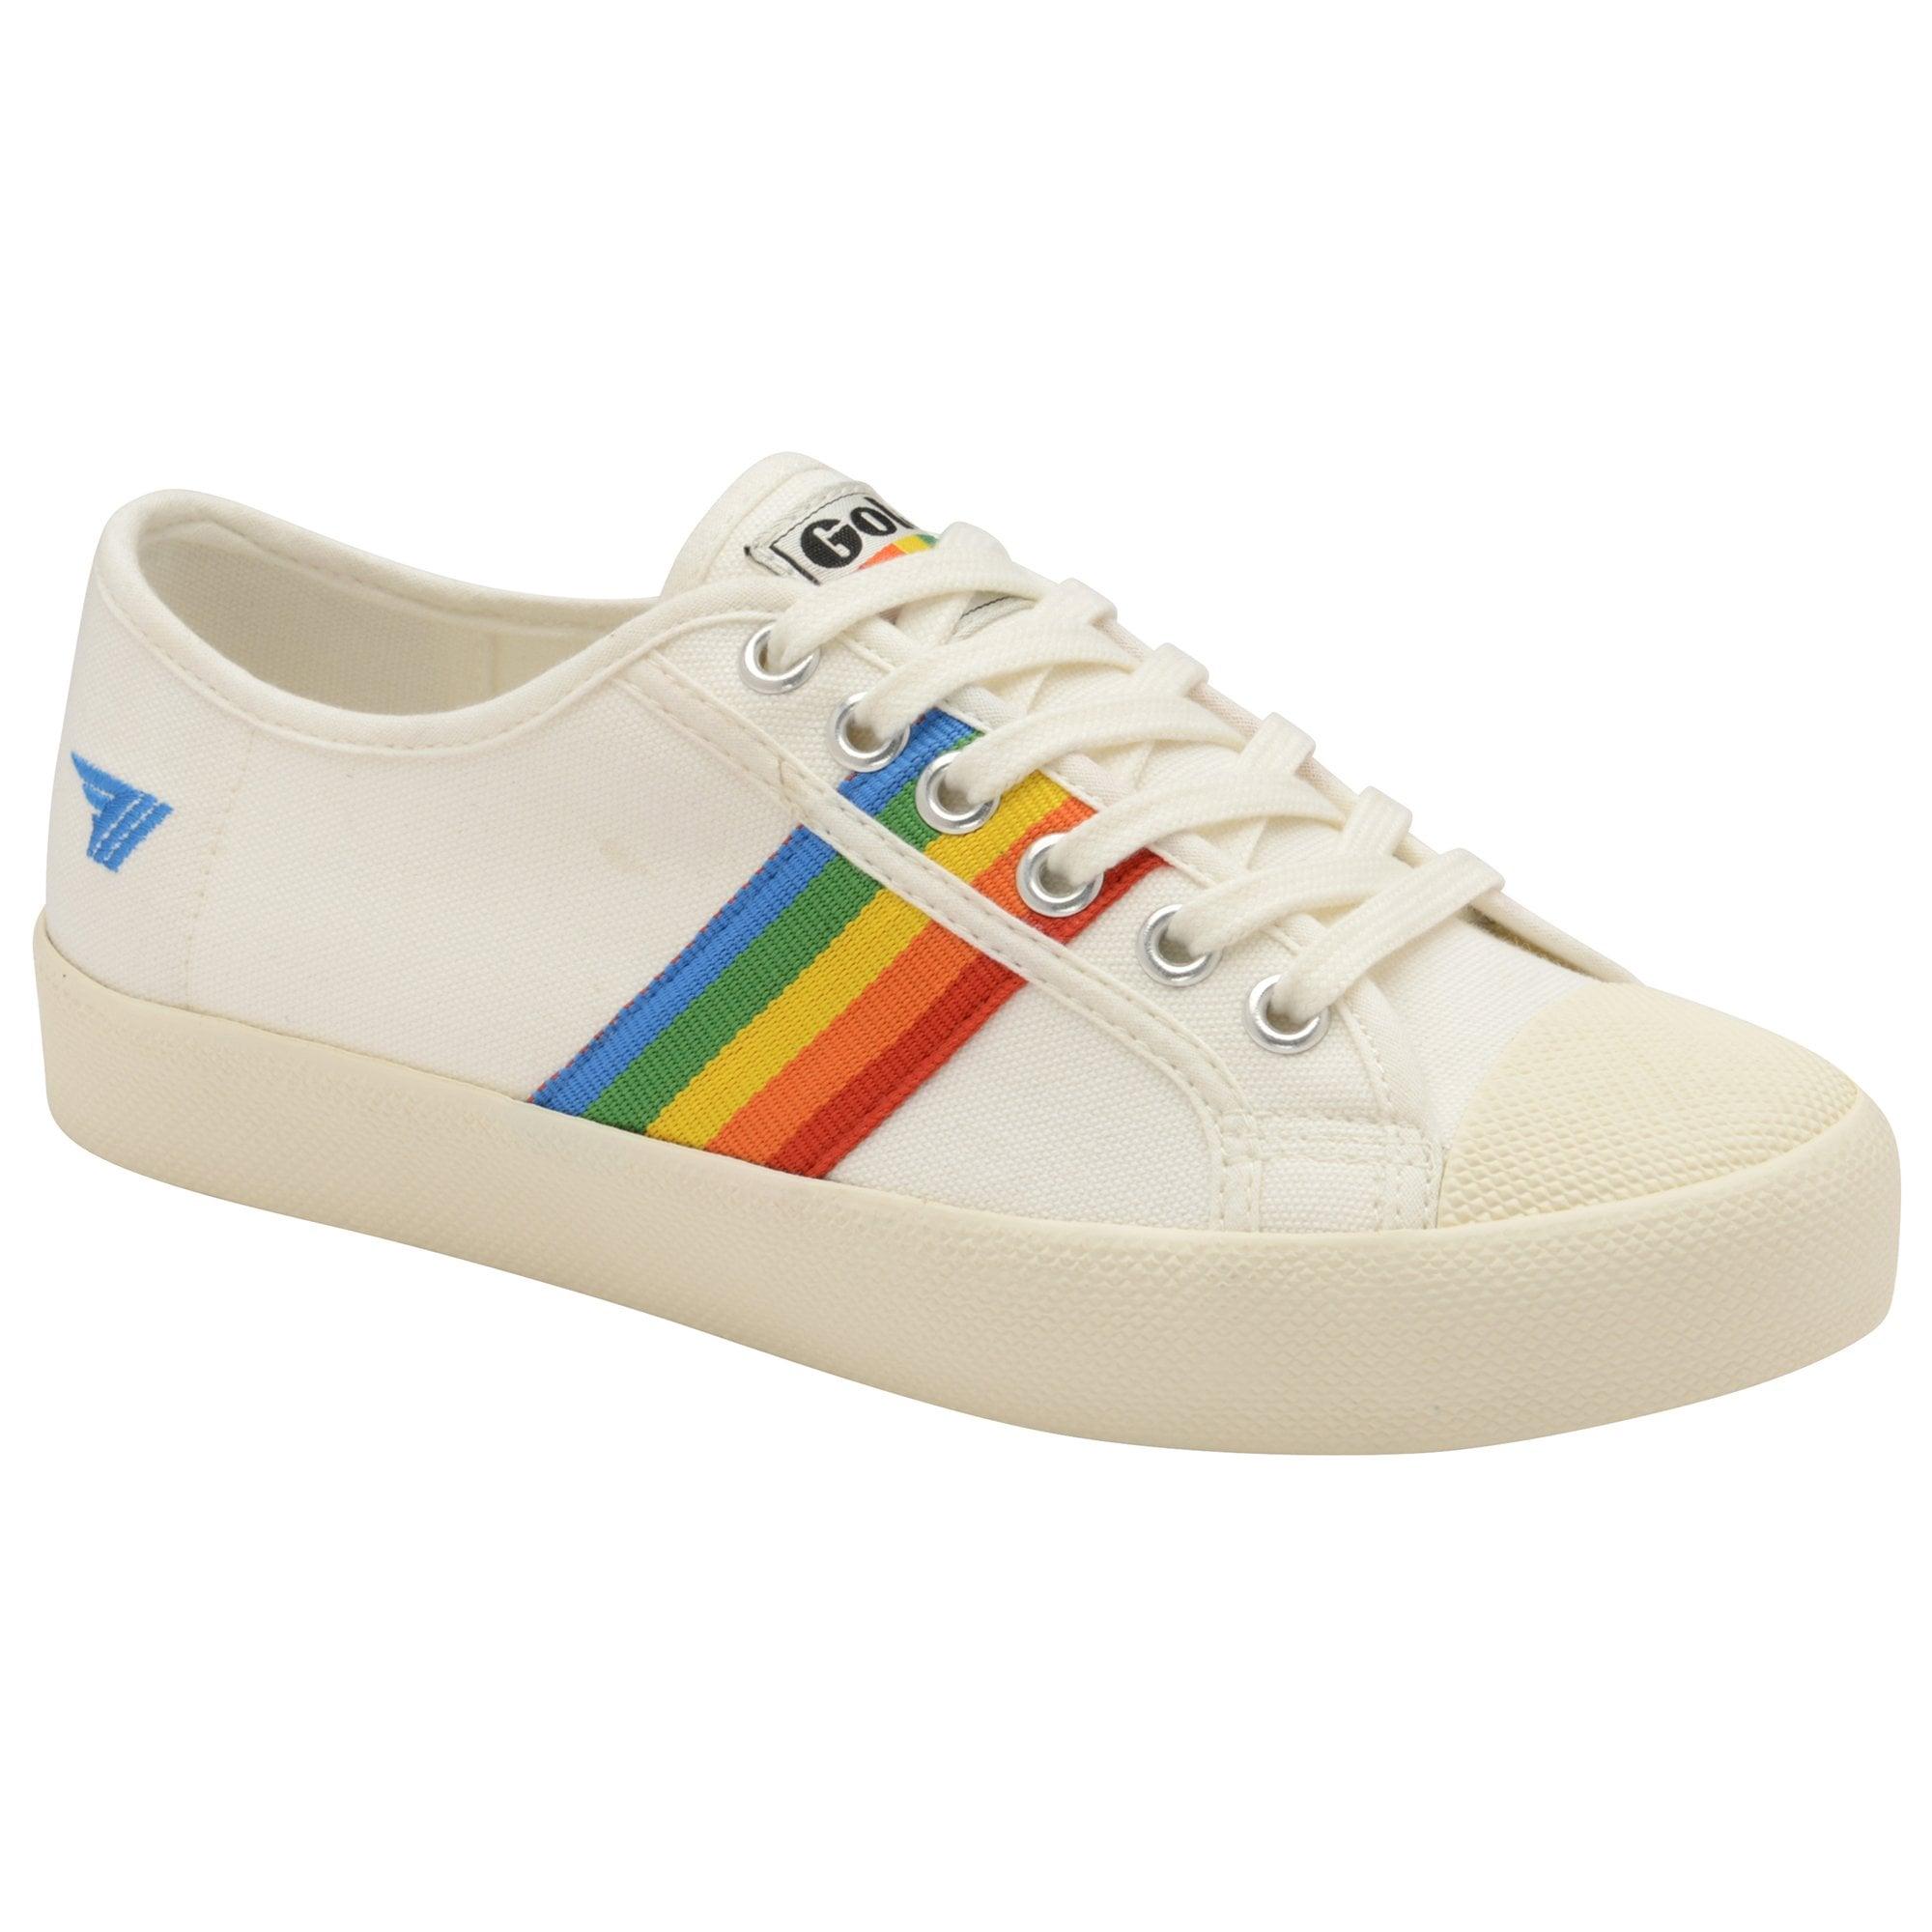 Buy Gola womens Coaster Rainbow trainer